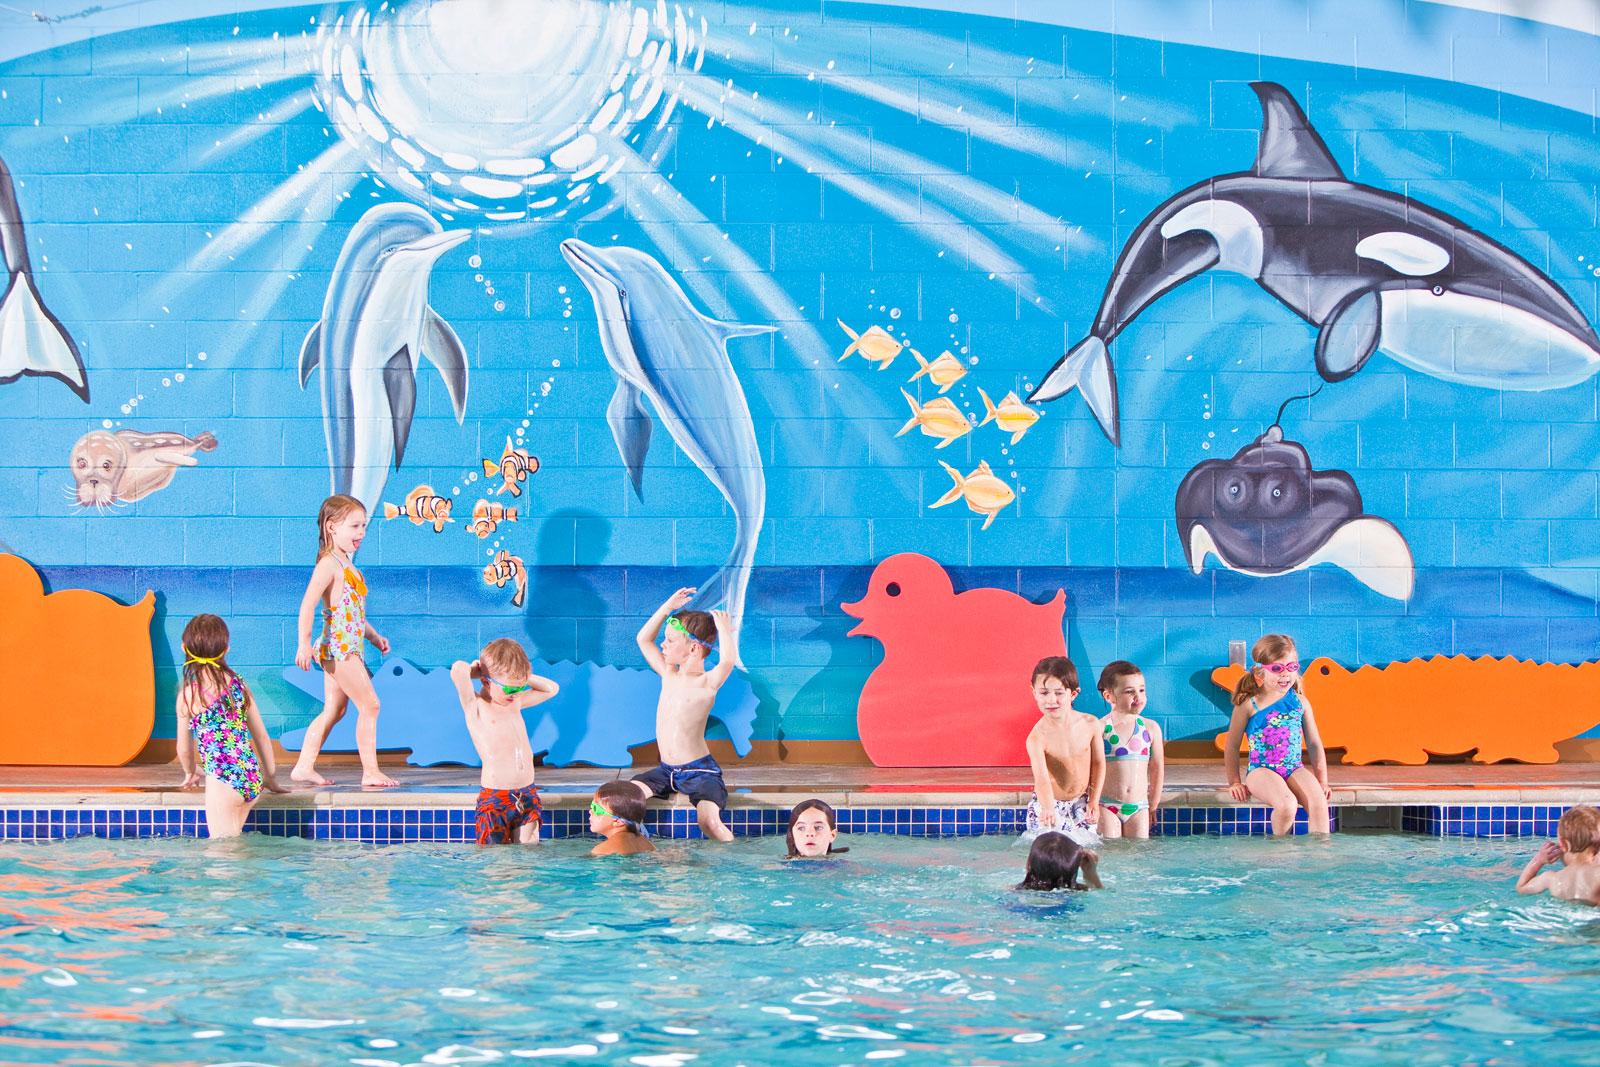 New Goldfish Swim School Website Makes A Splash